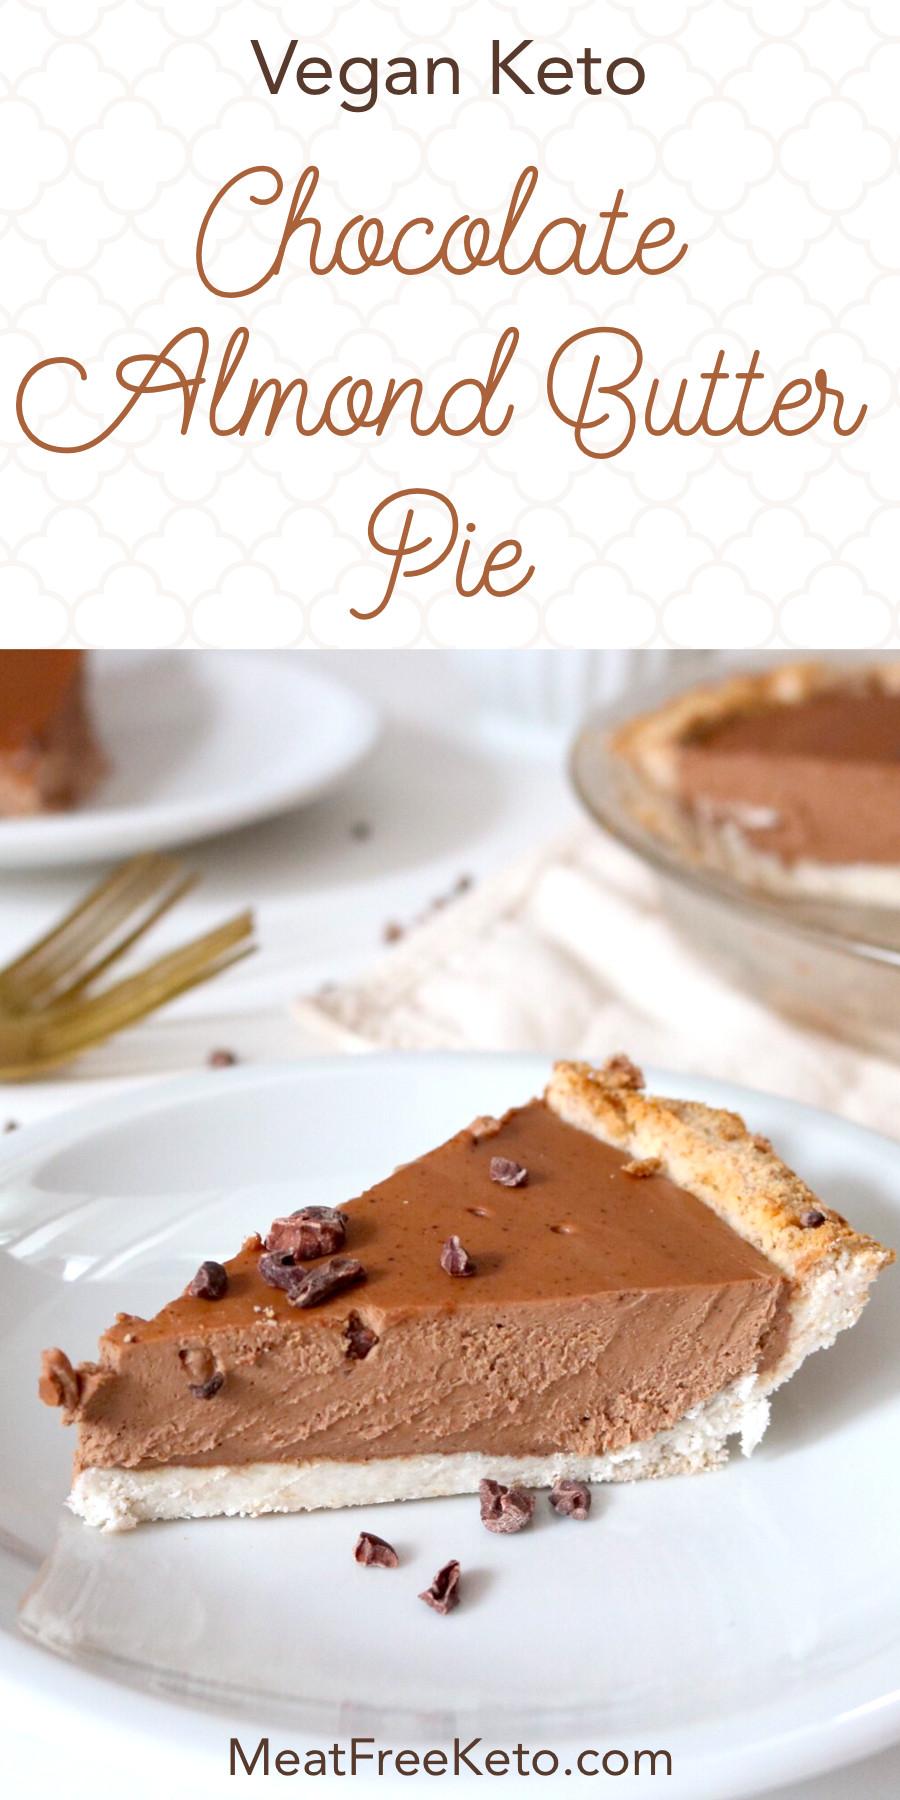 Keto Dairy Free Desserts  Vegan Keto Chocolate Almond Butter Pie